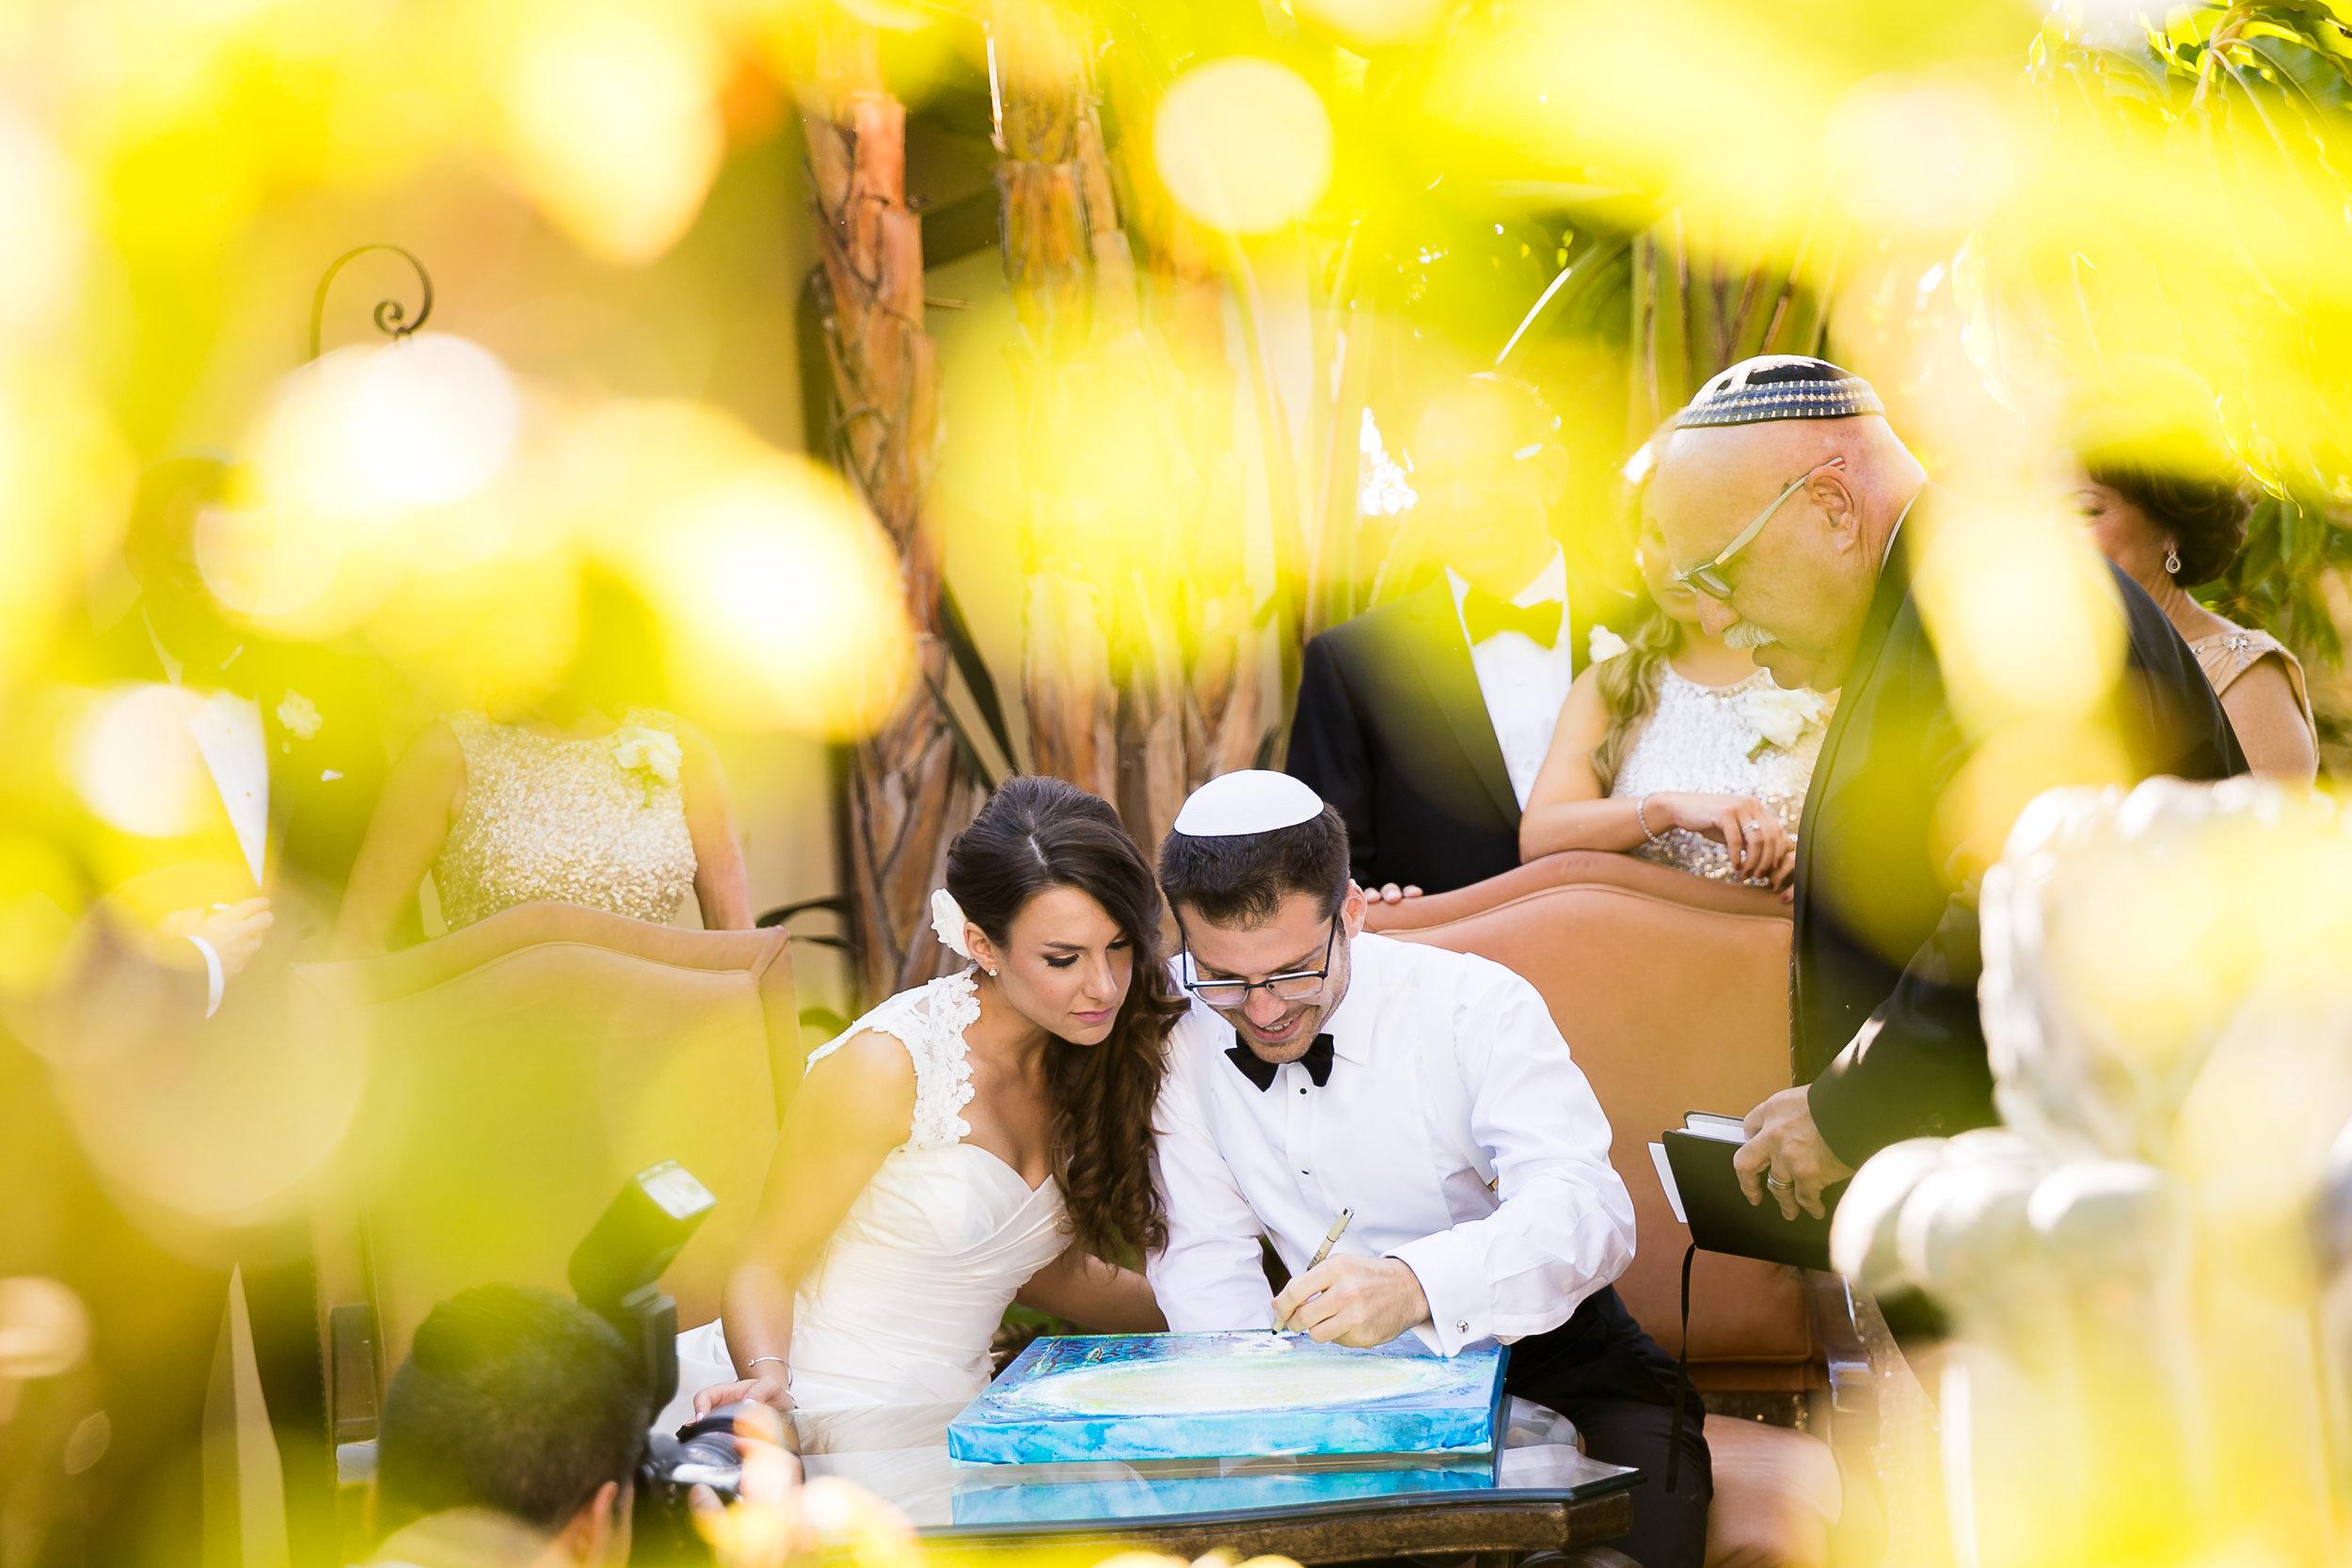 07-ketubah-signing-jewish-wedding-photography.jpg